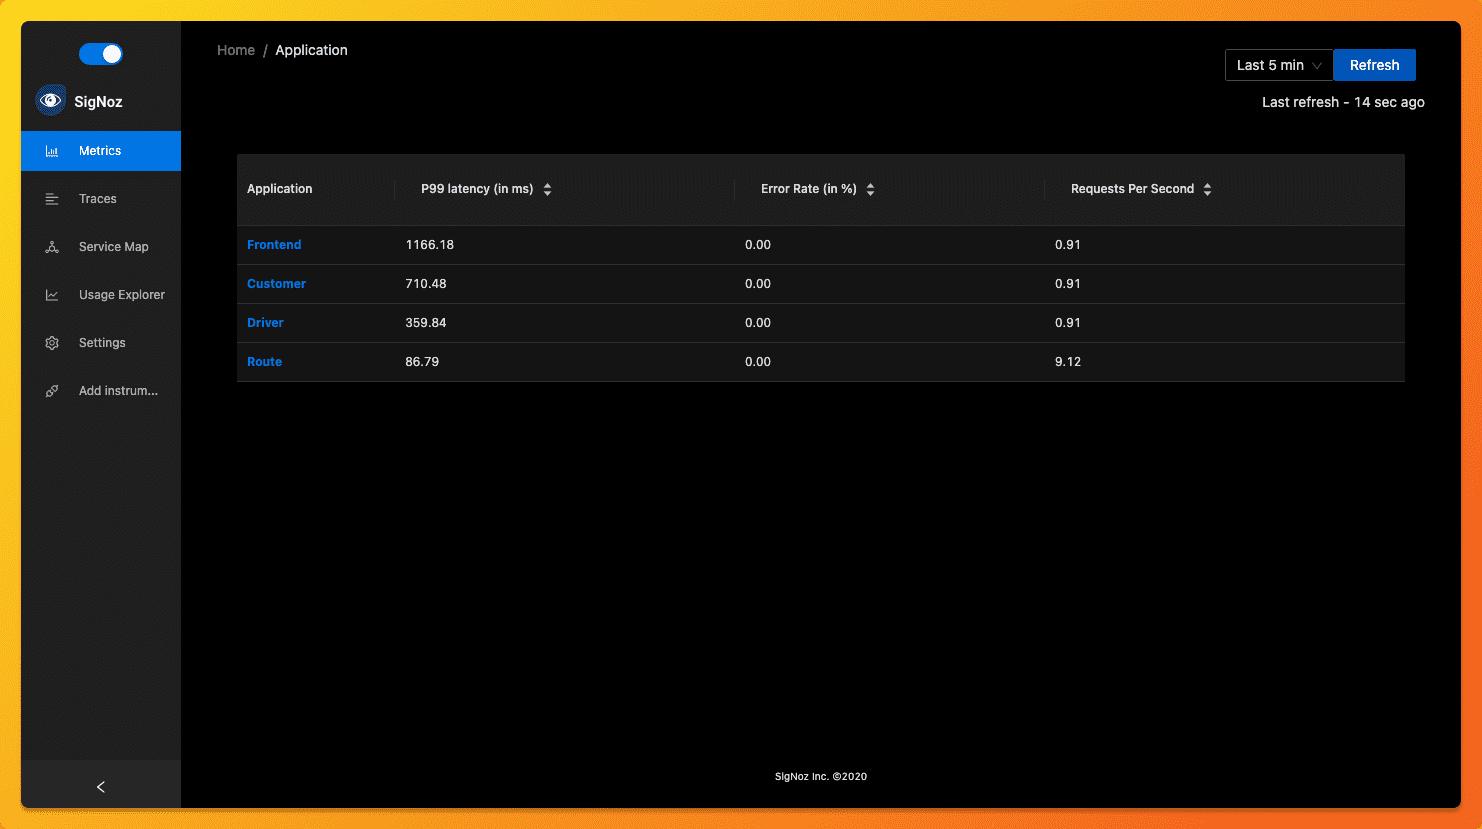 SigNoz dashboard showing application list